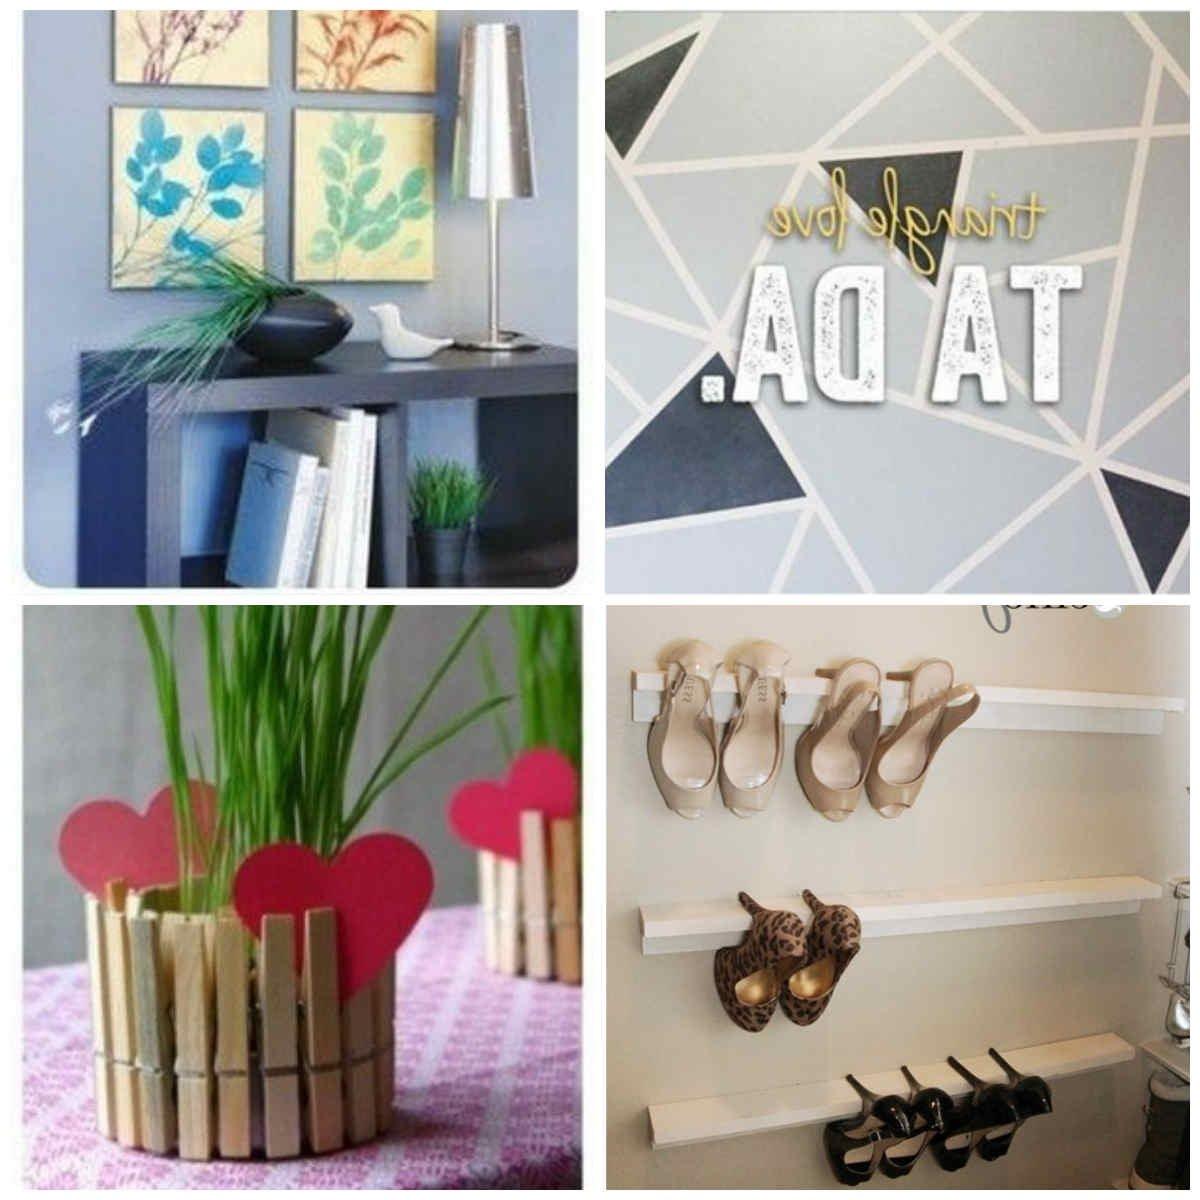 Diy Home Decor Ideas Pinterest Wwwpixsharkcom Images, Pinterest Diy  regarding Easy Craft Ideas For Home